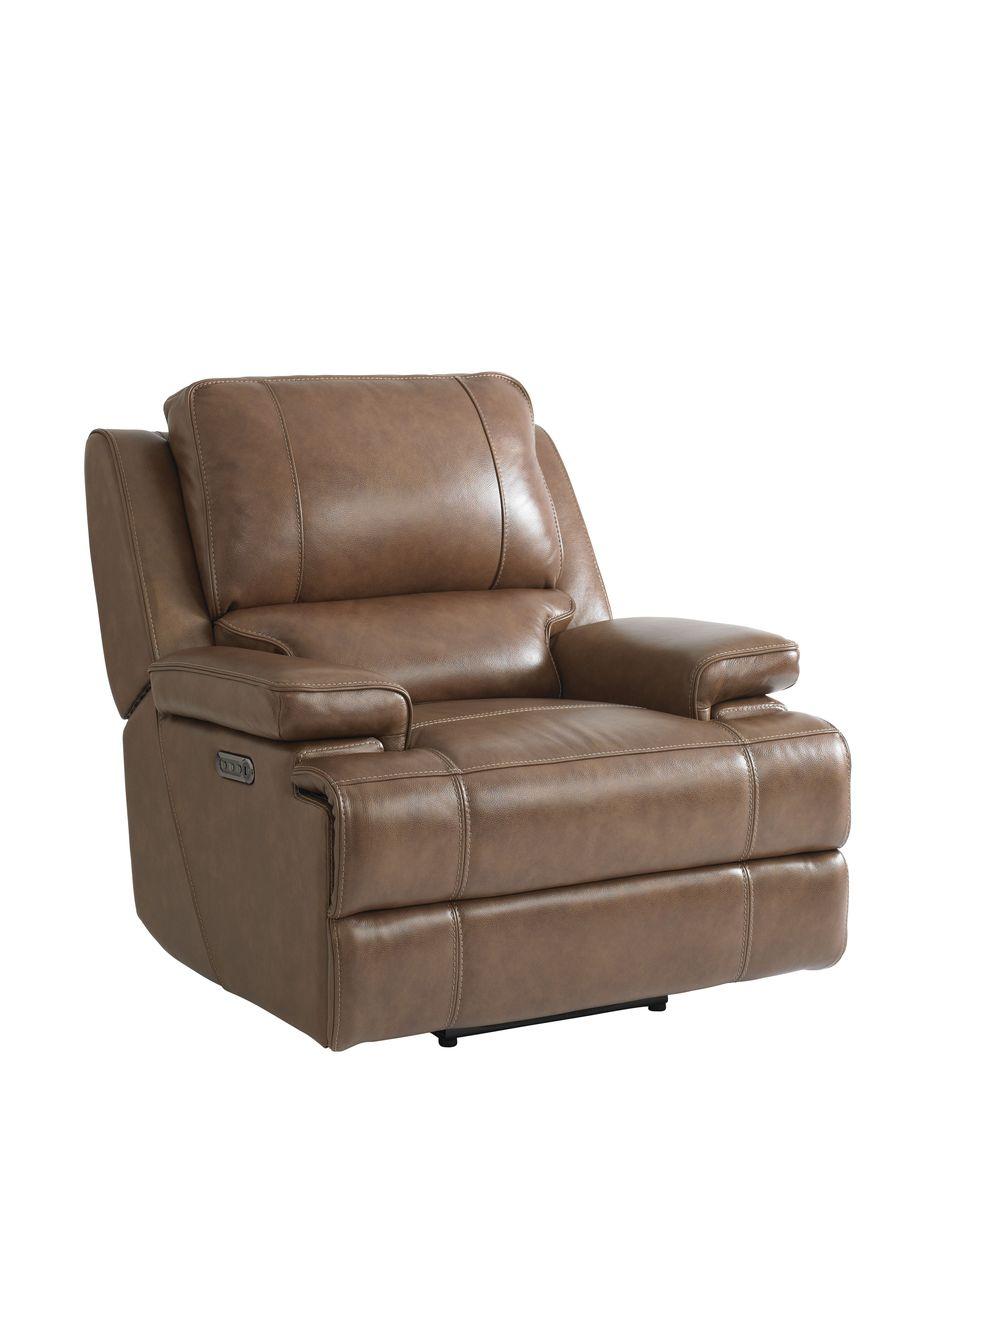 Bassett Furniture - Parsons Power Wallsaver Recliner